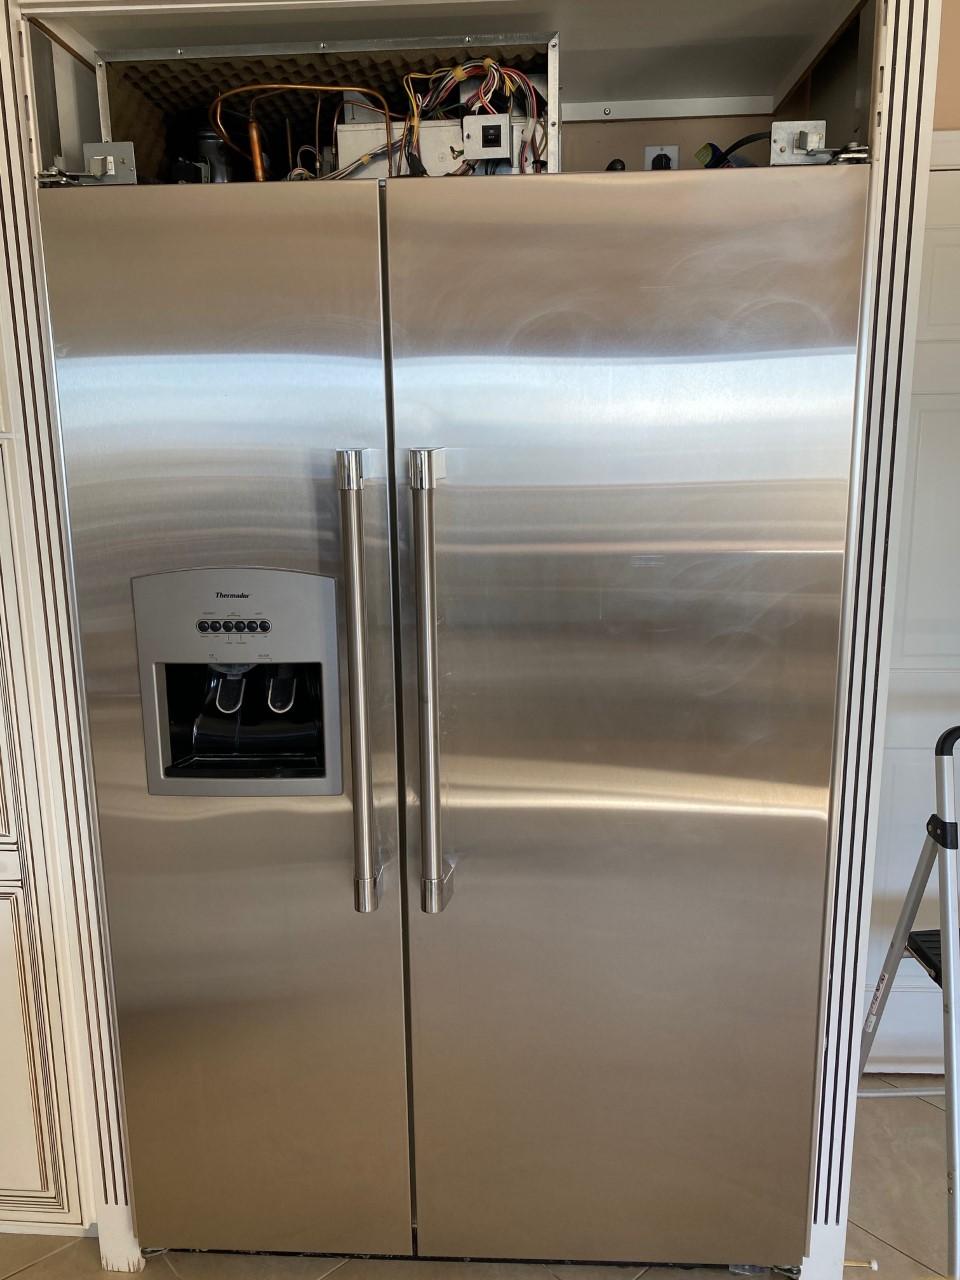 Commercial Refrigerator repair malibu